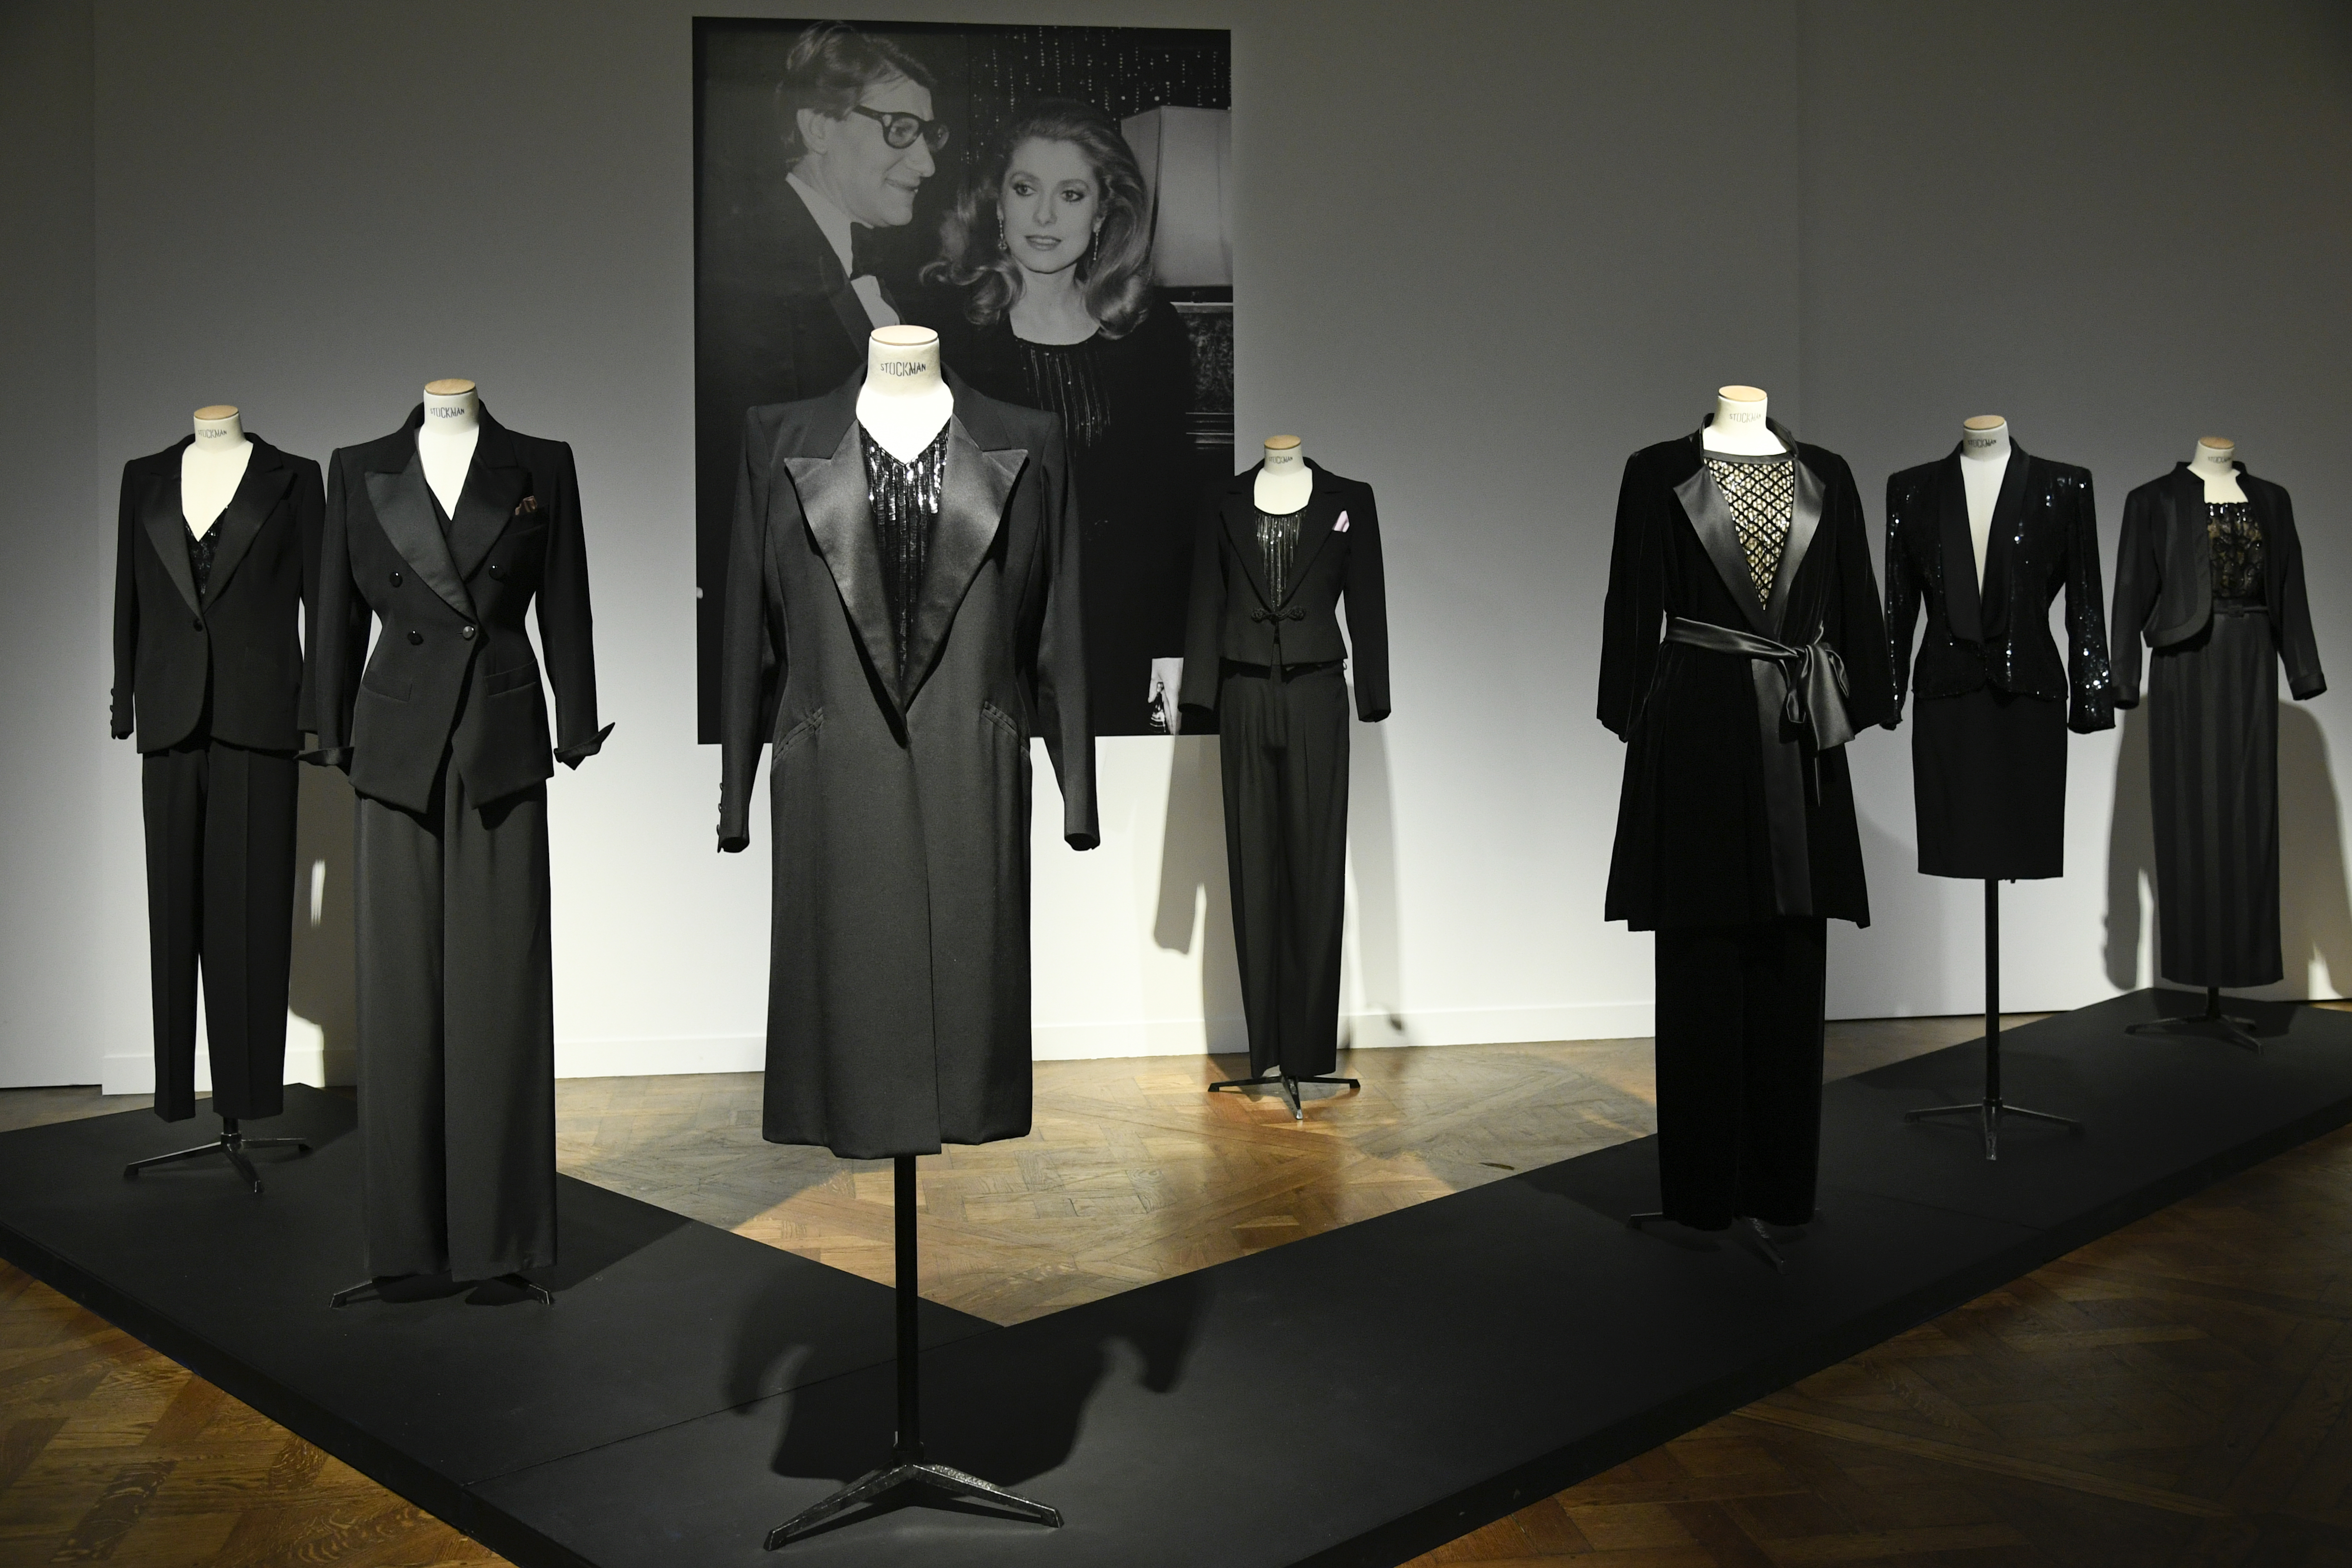 Catherine Deneuve's collection of Yves Saint Laurent suits